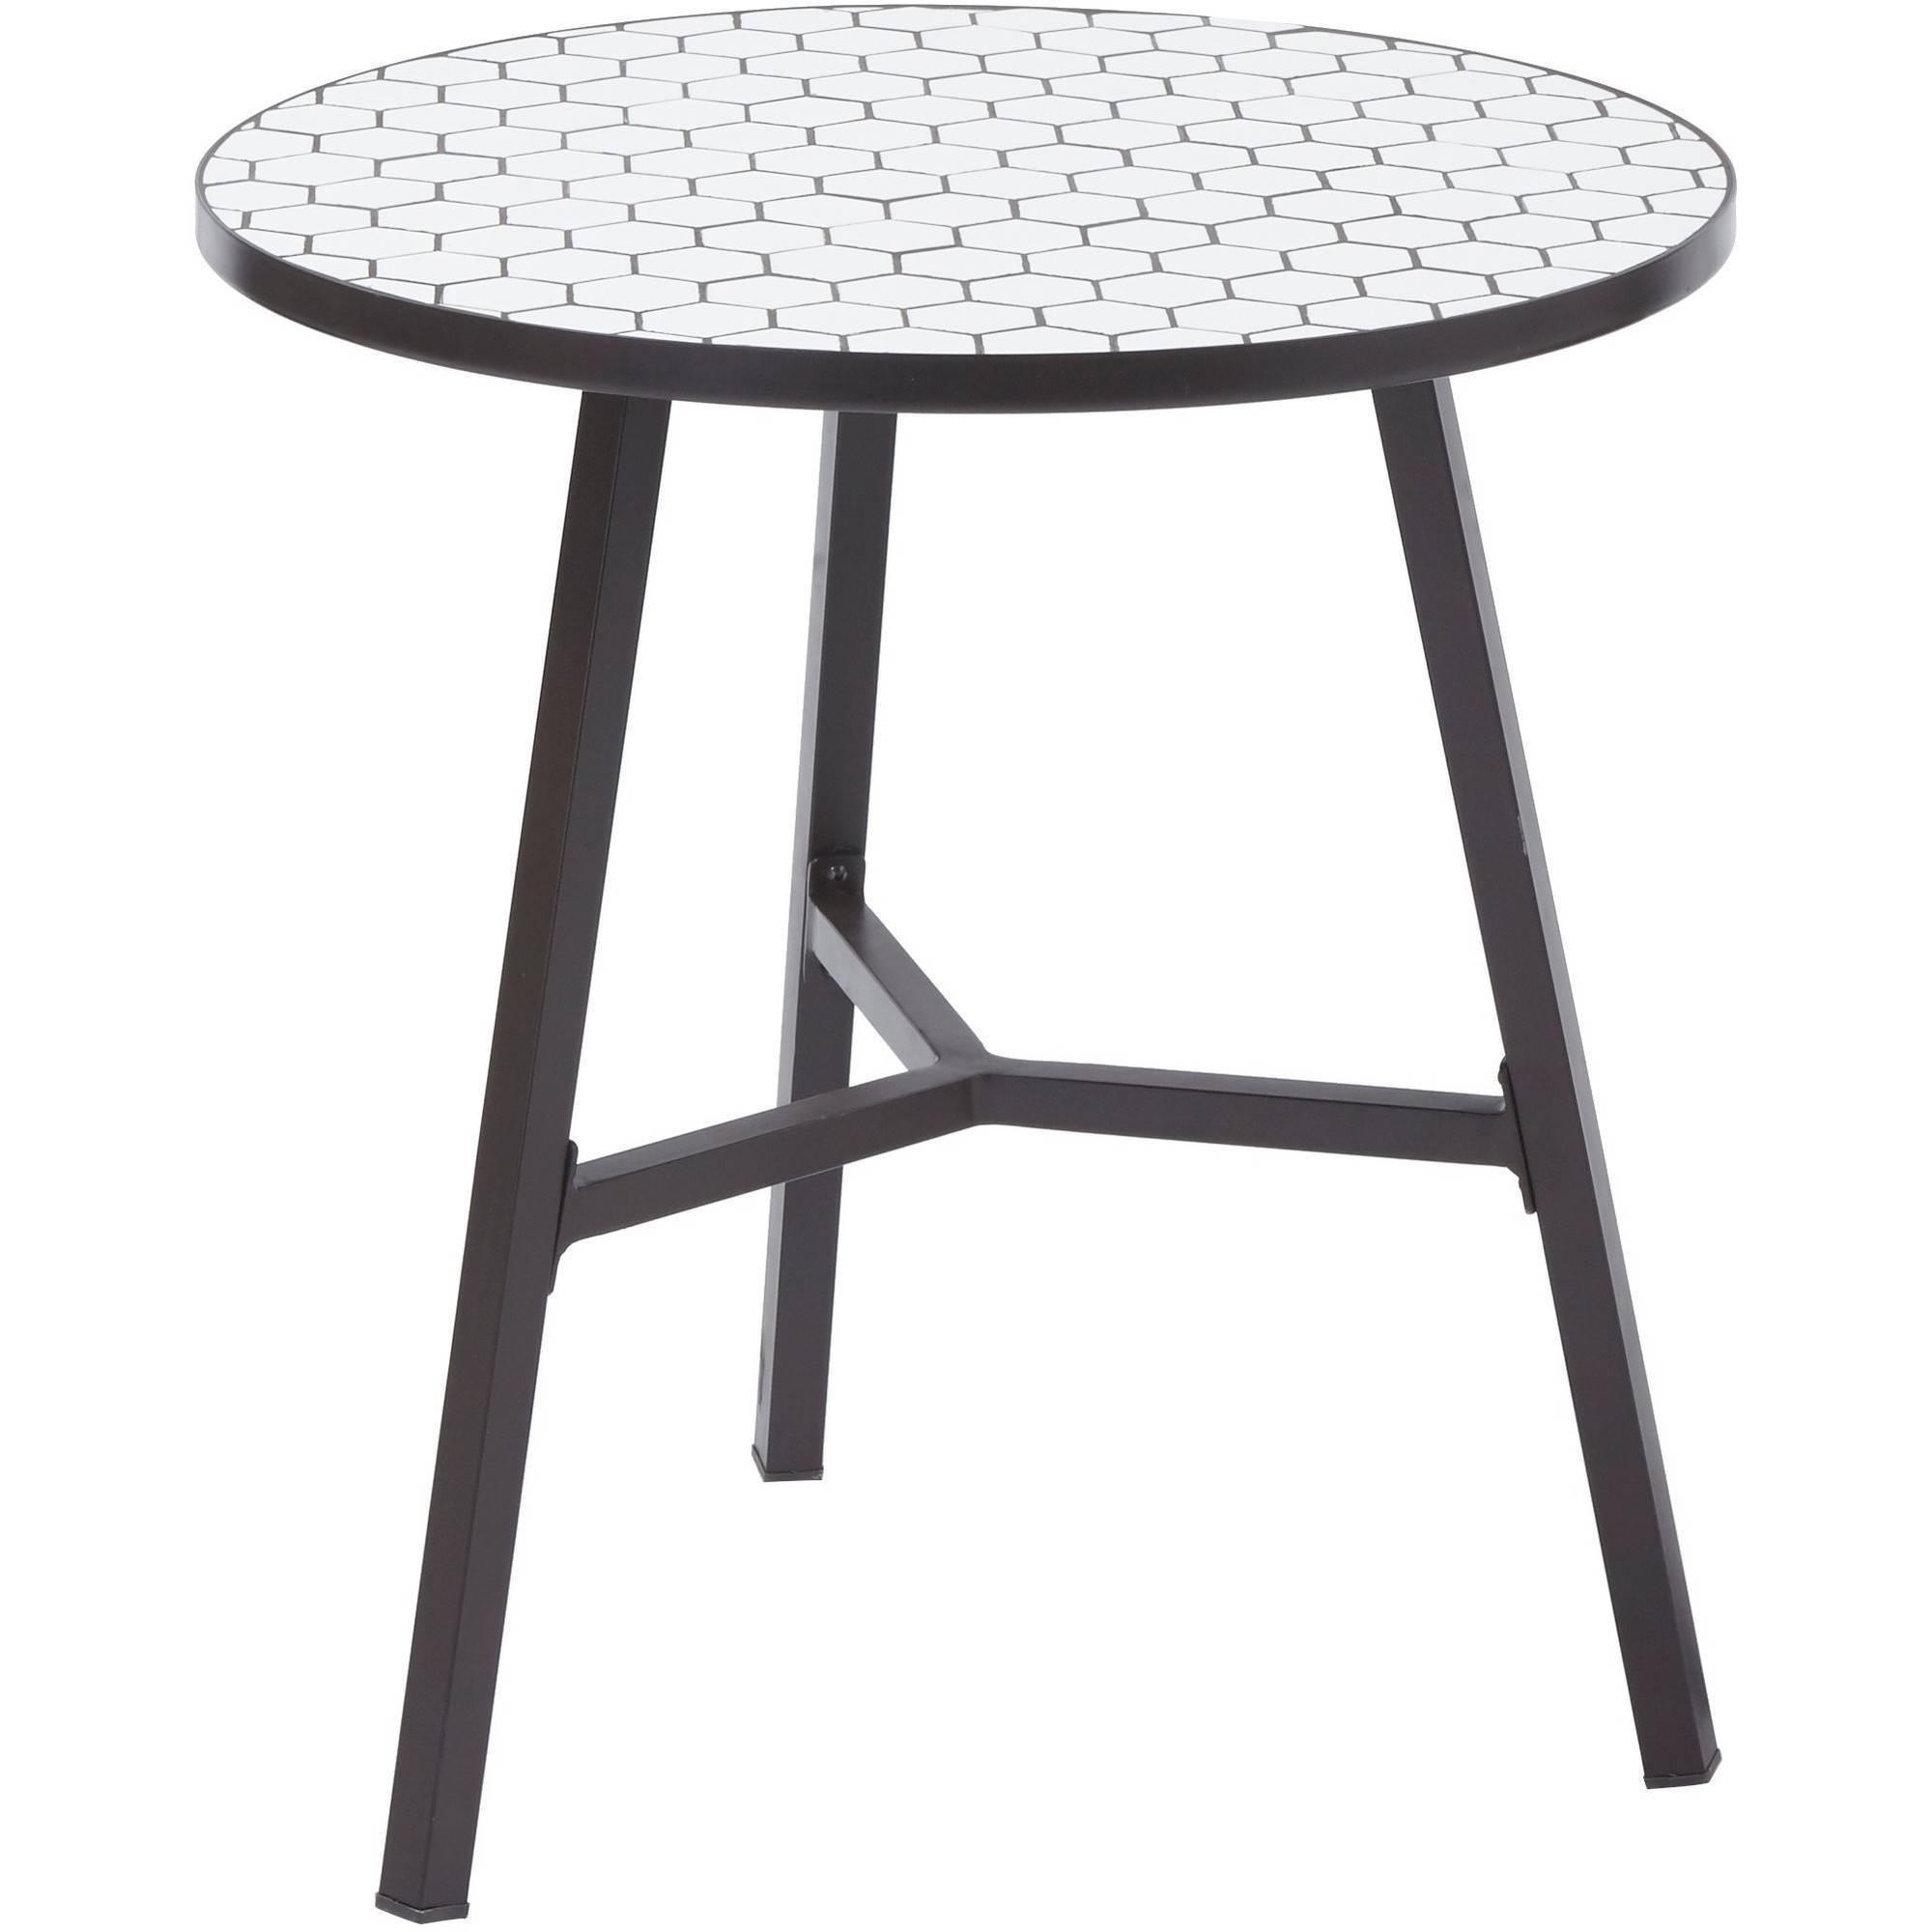 outdoor table patio furniture - walmart.com ZSOAVBX